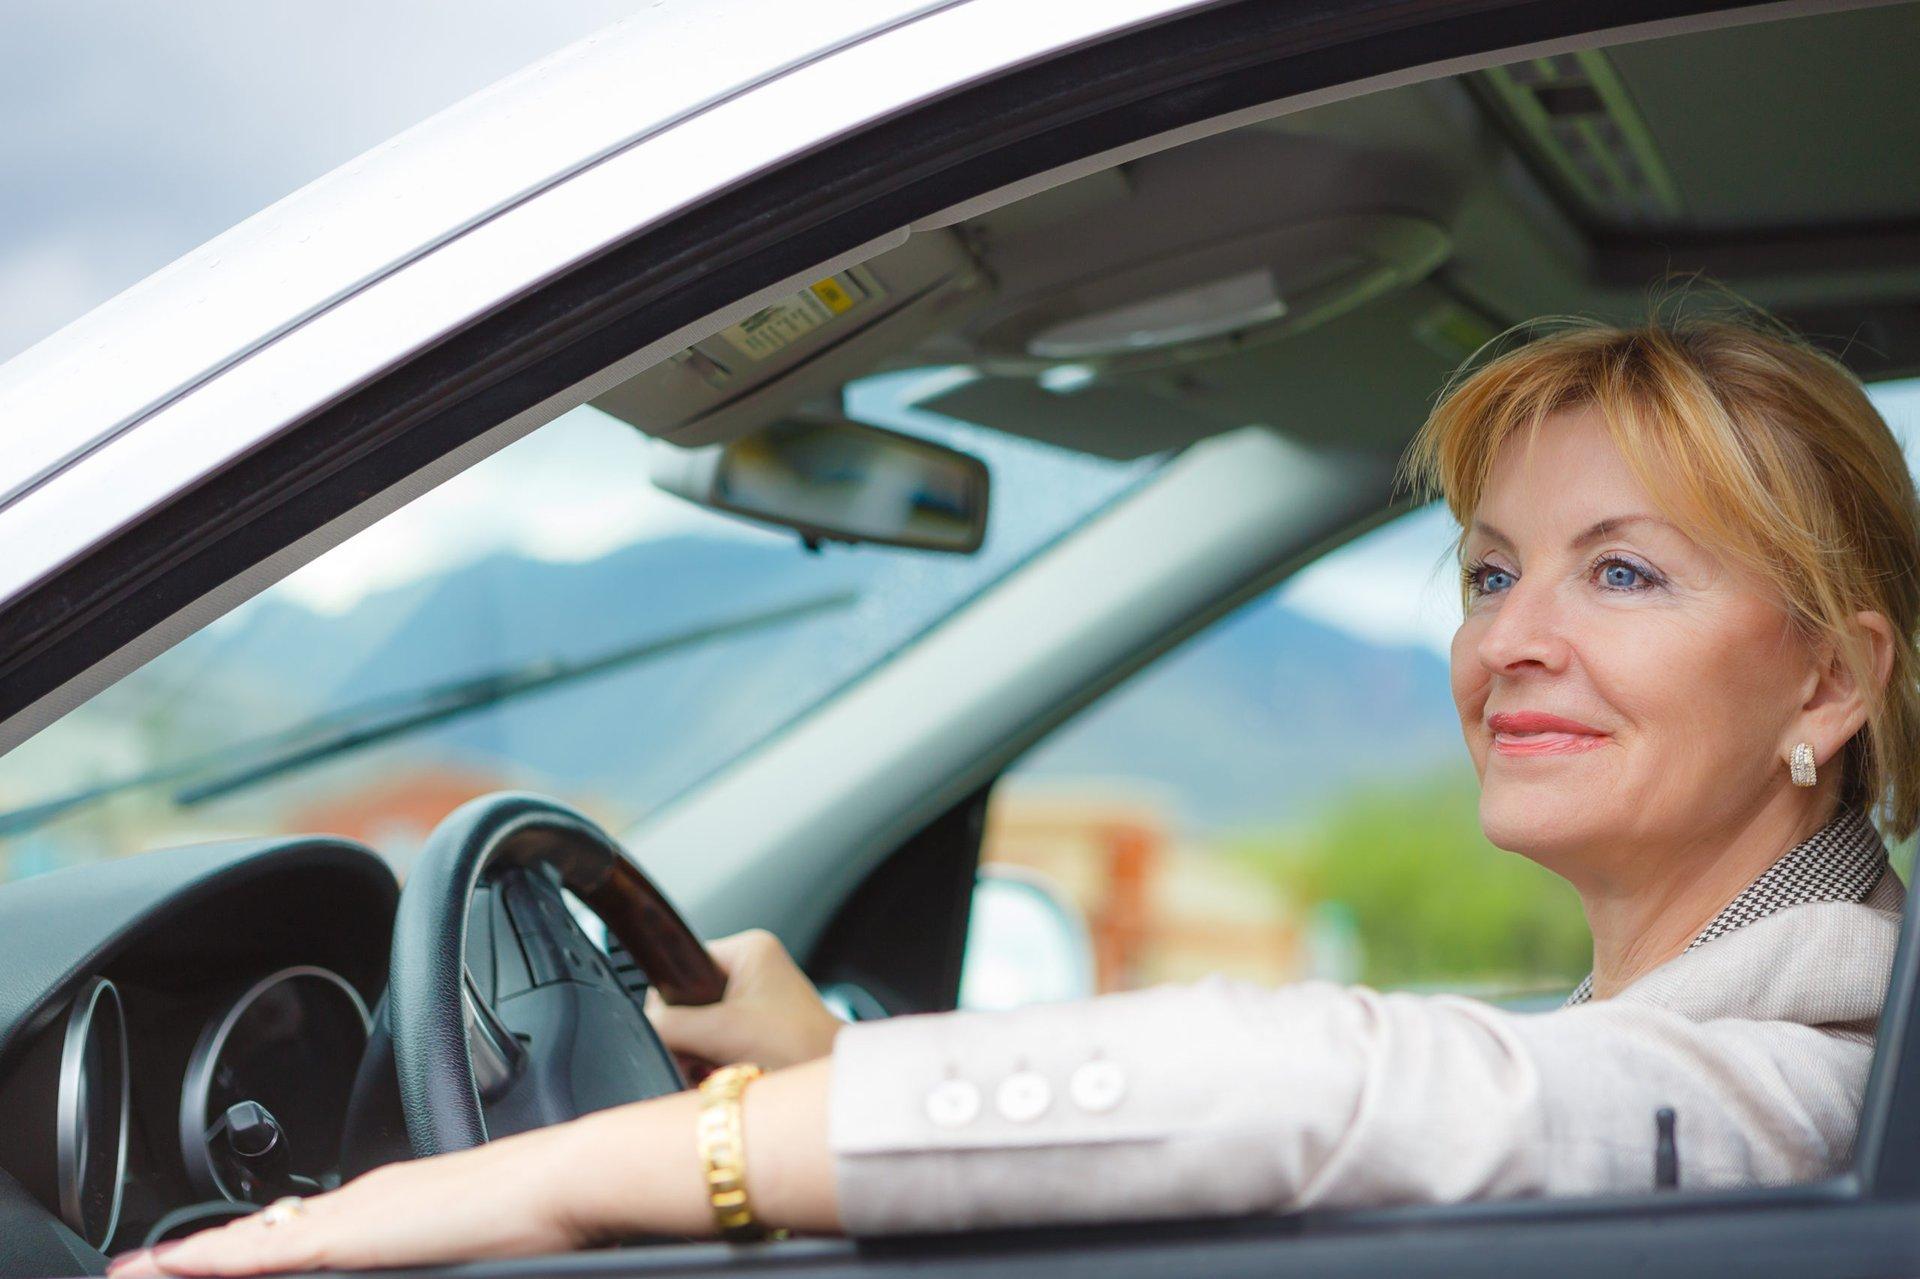 an older woman drives a car